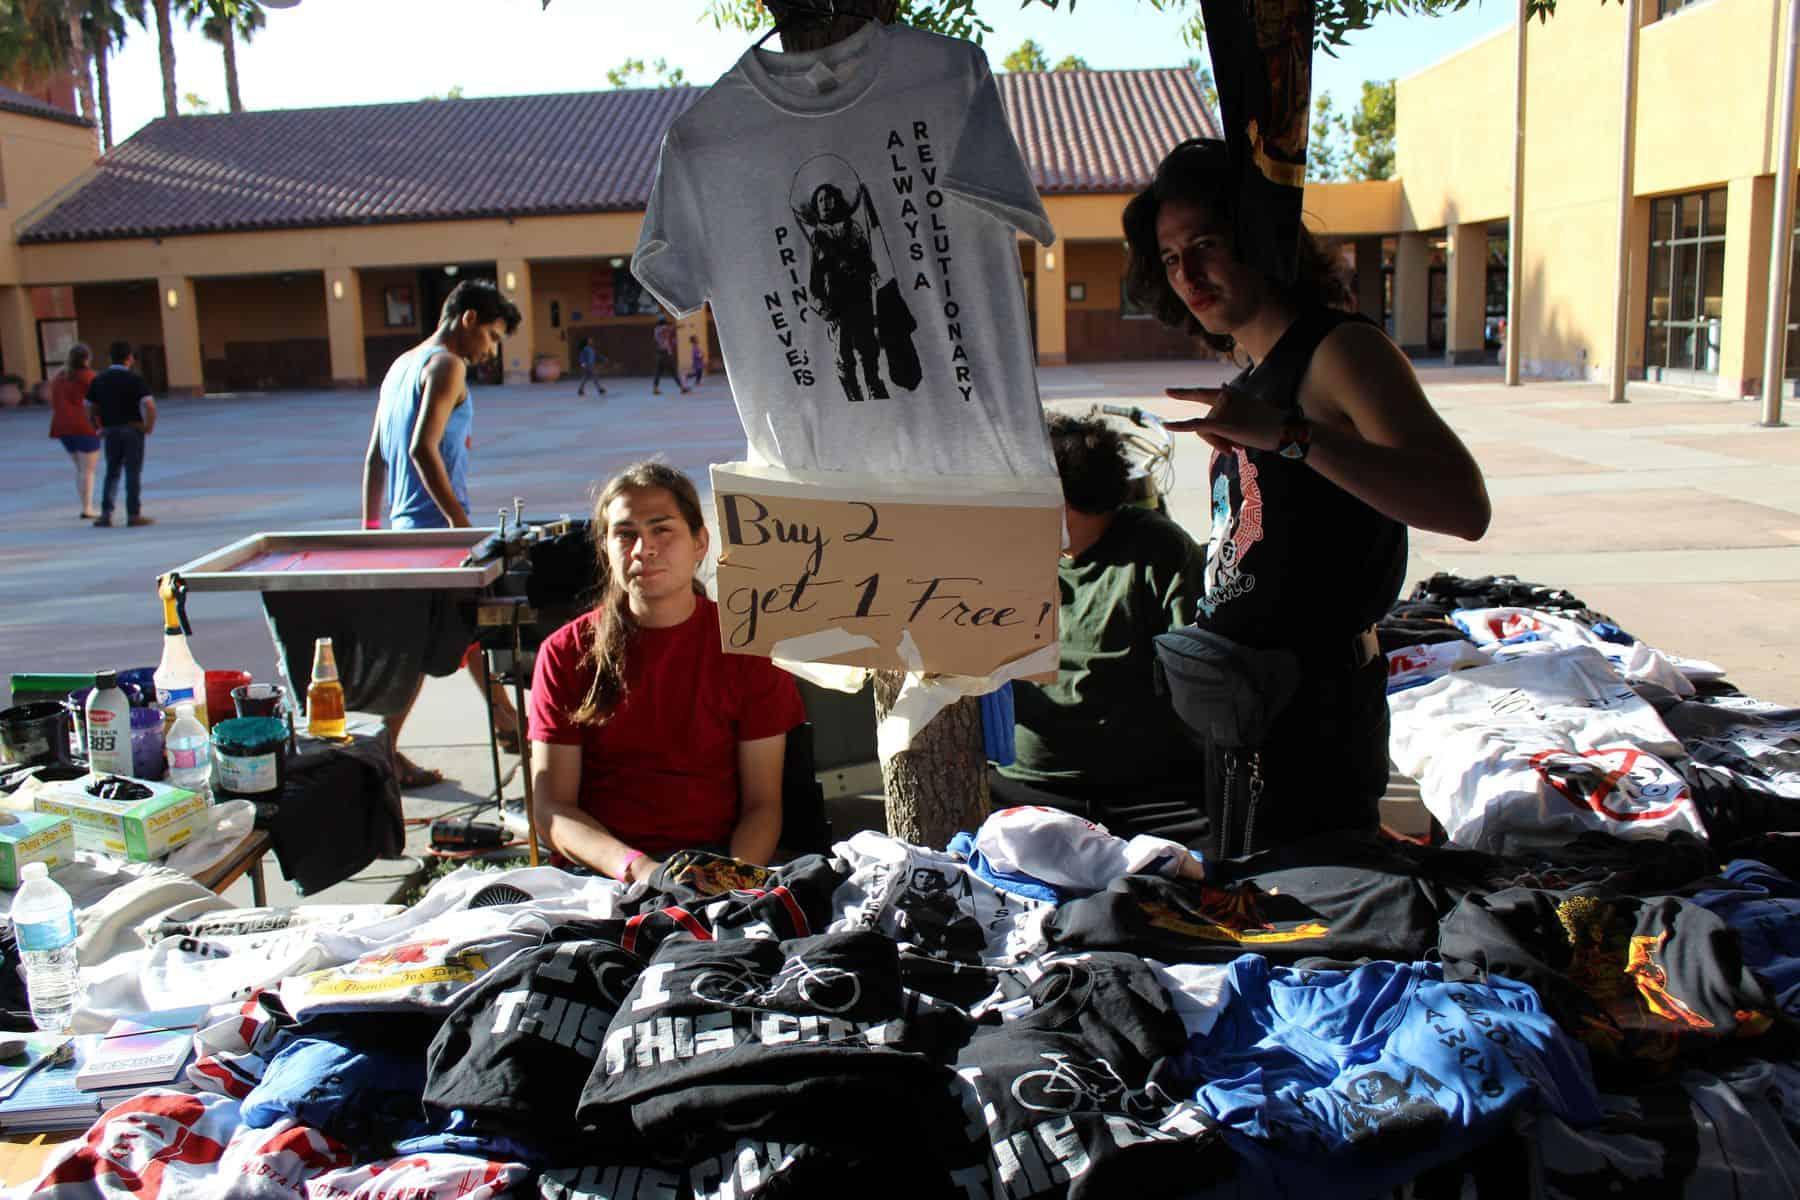 T Shirt Vendor Booth